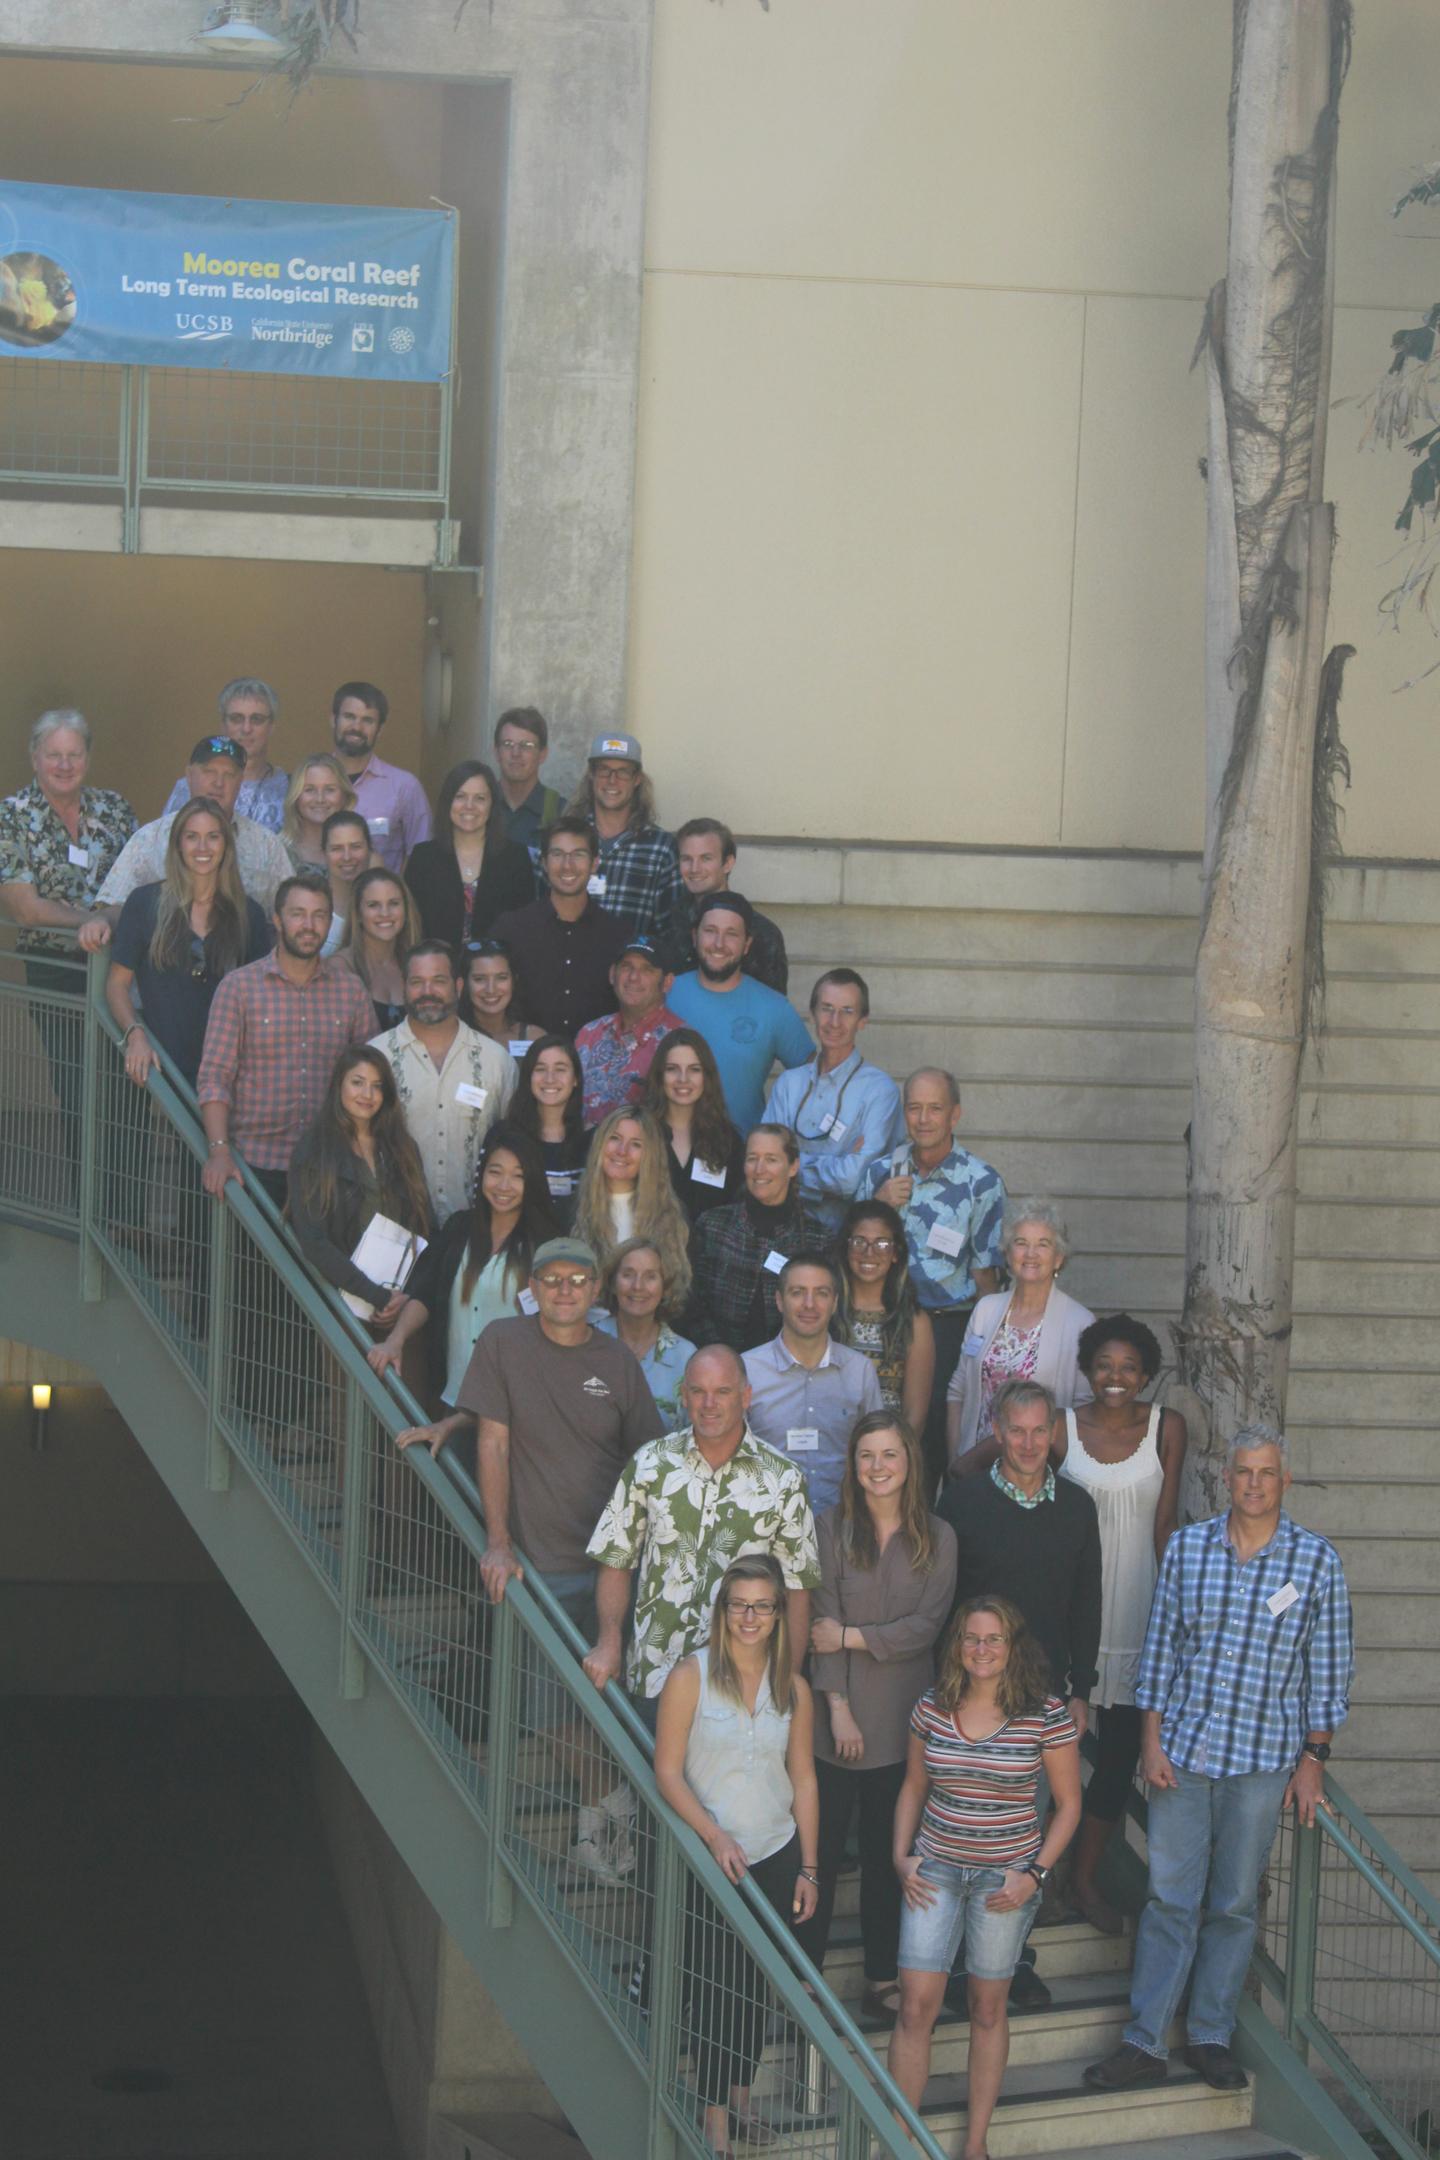 2016 MCR All Investigators Meeting photo